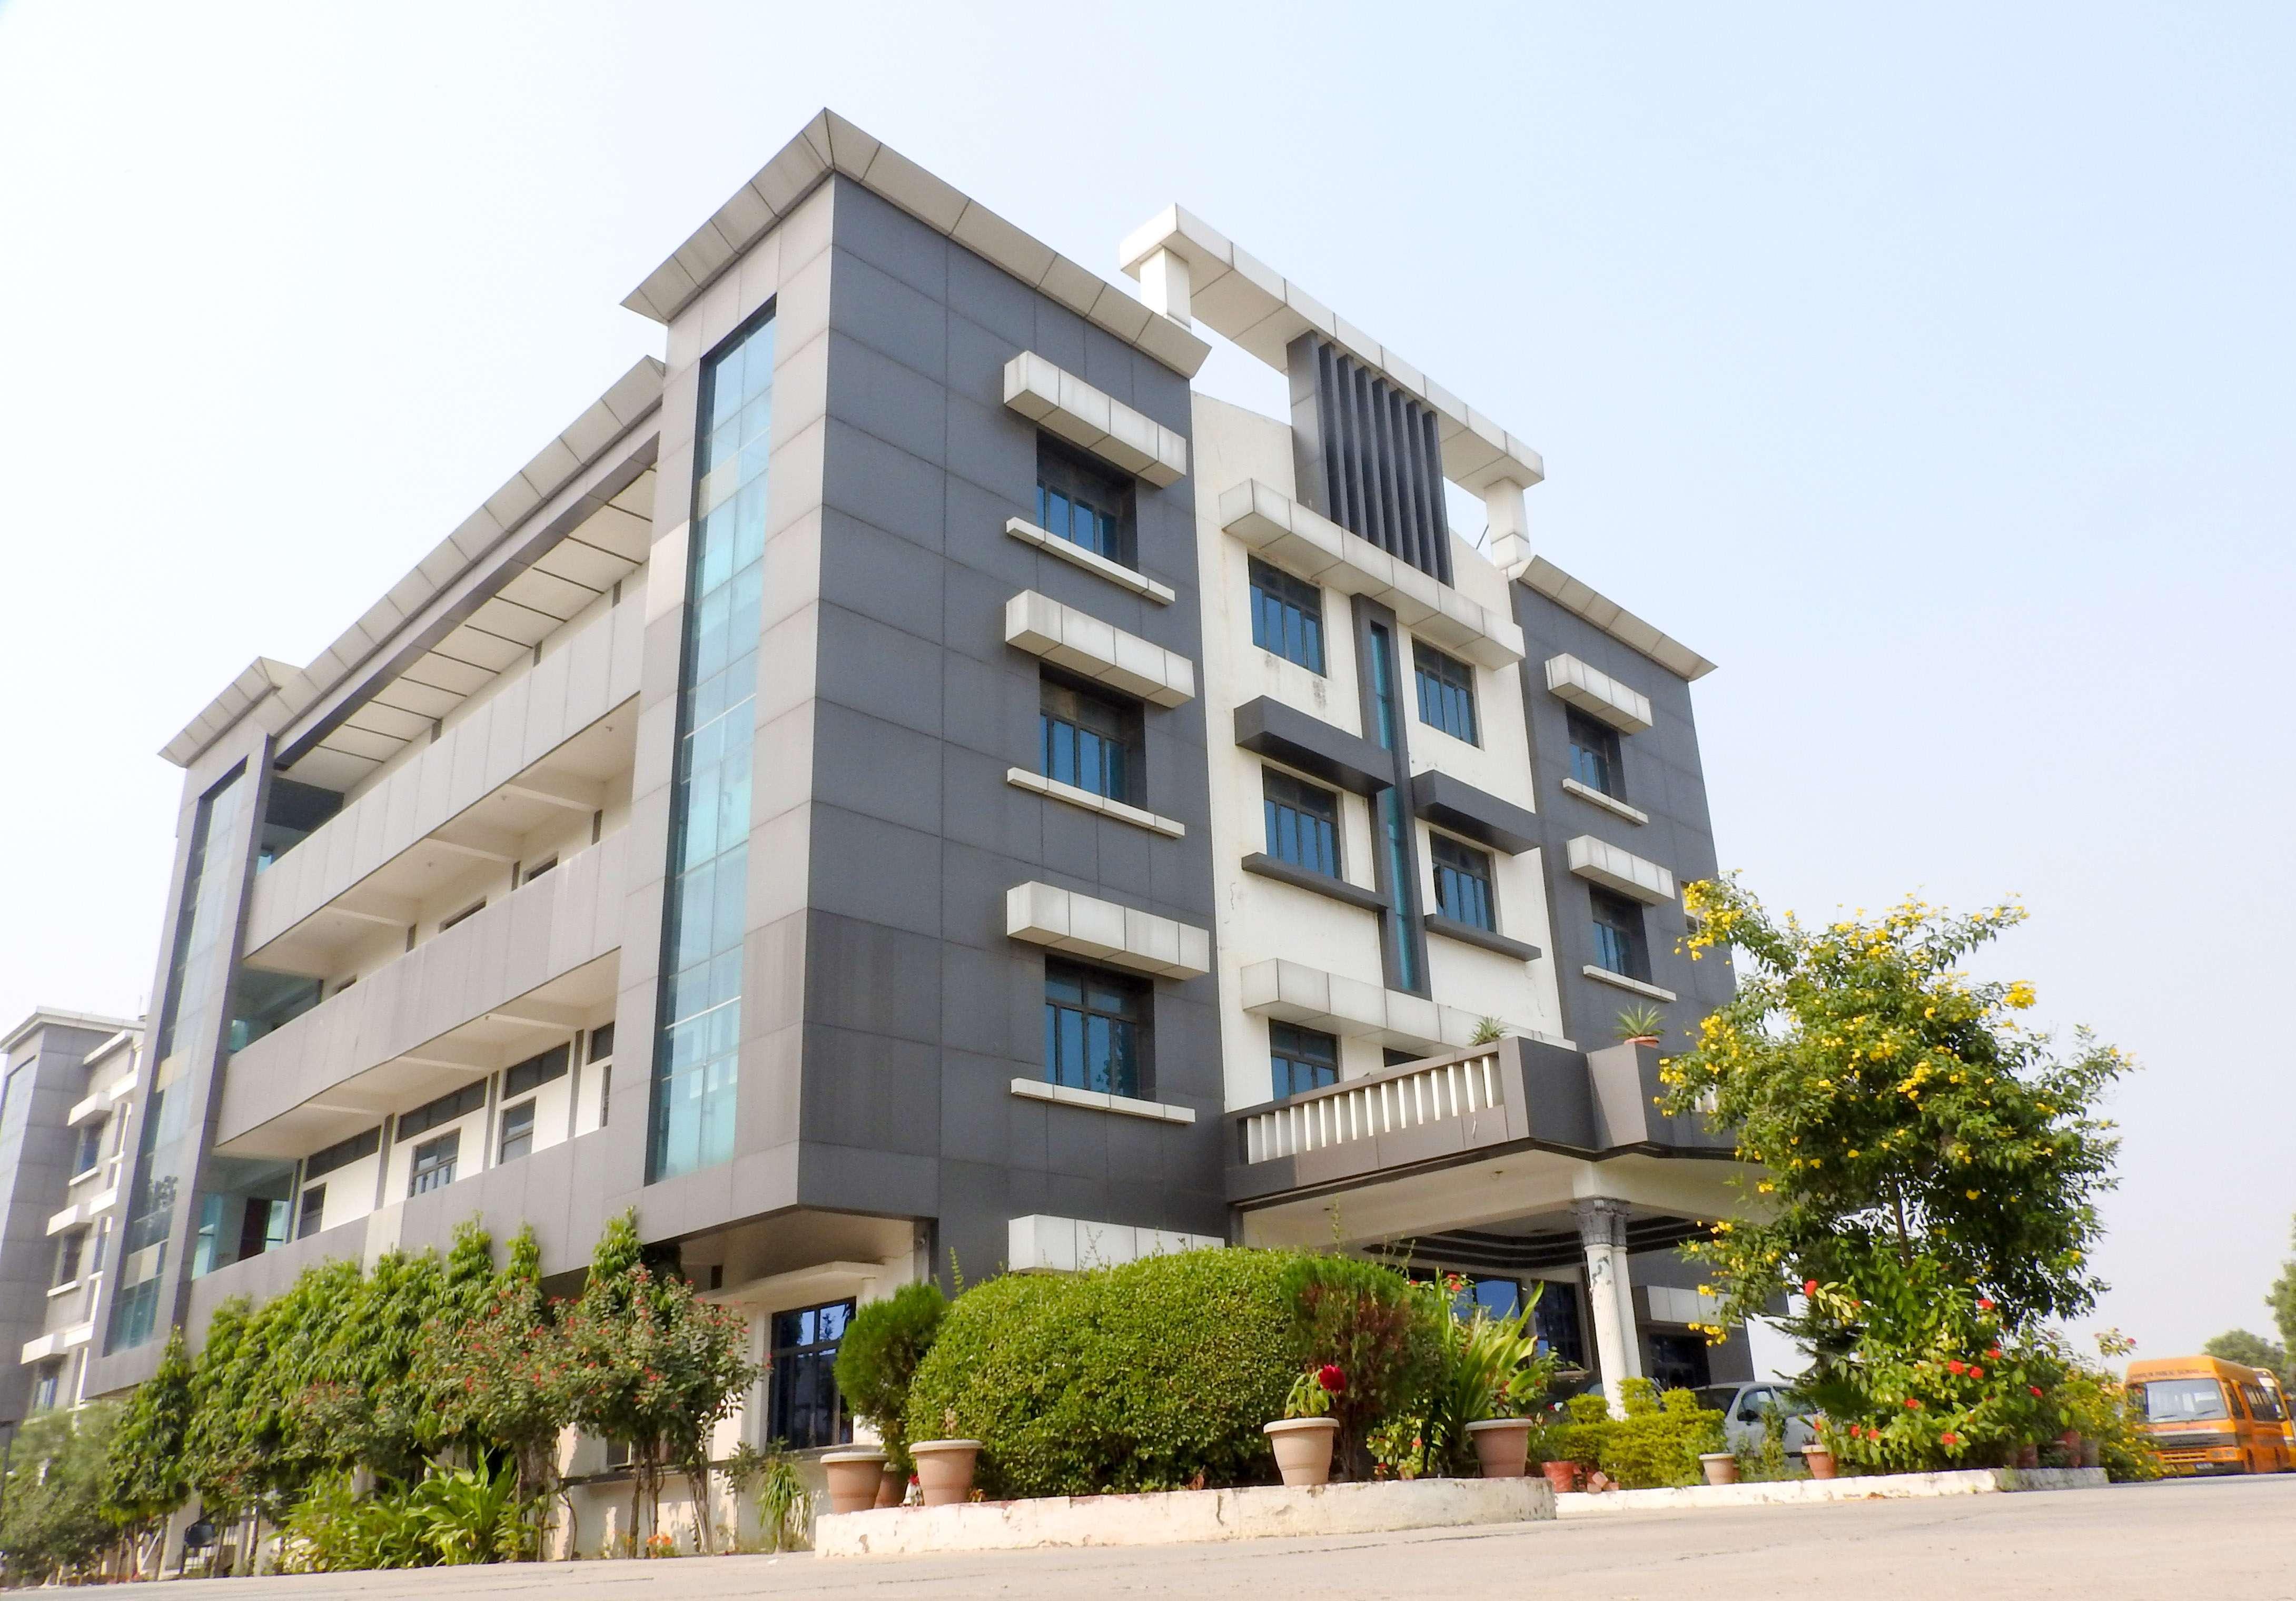 Shivalik Public School MAGTAI BHICHPURI ROAD 2130952